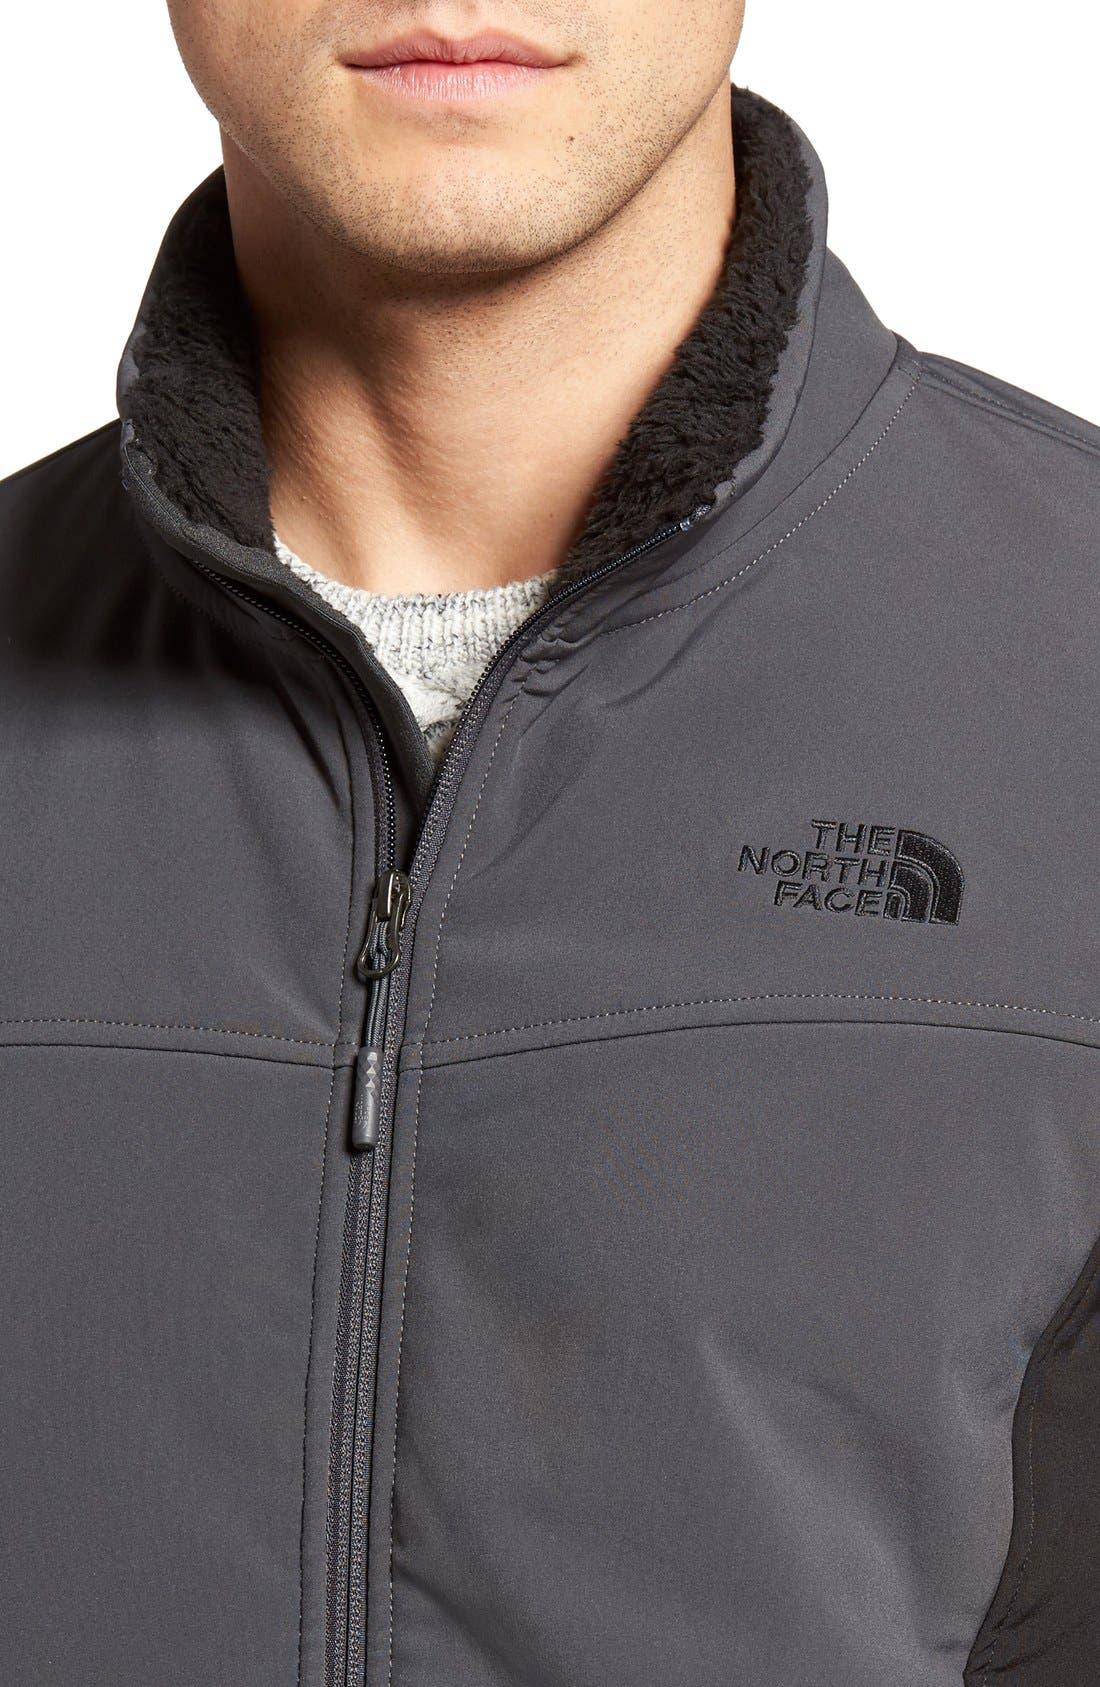 'Apex Chromium' Waterproof Thermal Jacket,                             Alternate thumbnail 4, color,                             Asphalt Grey/ Tnf Black